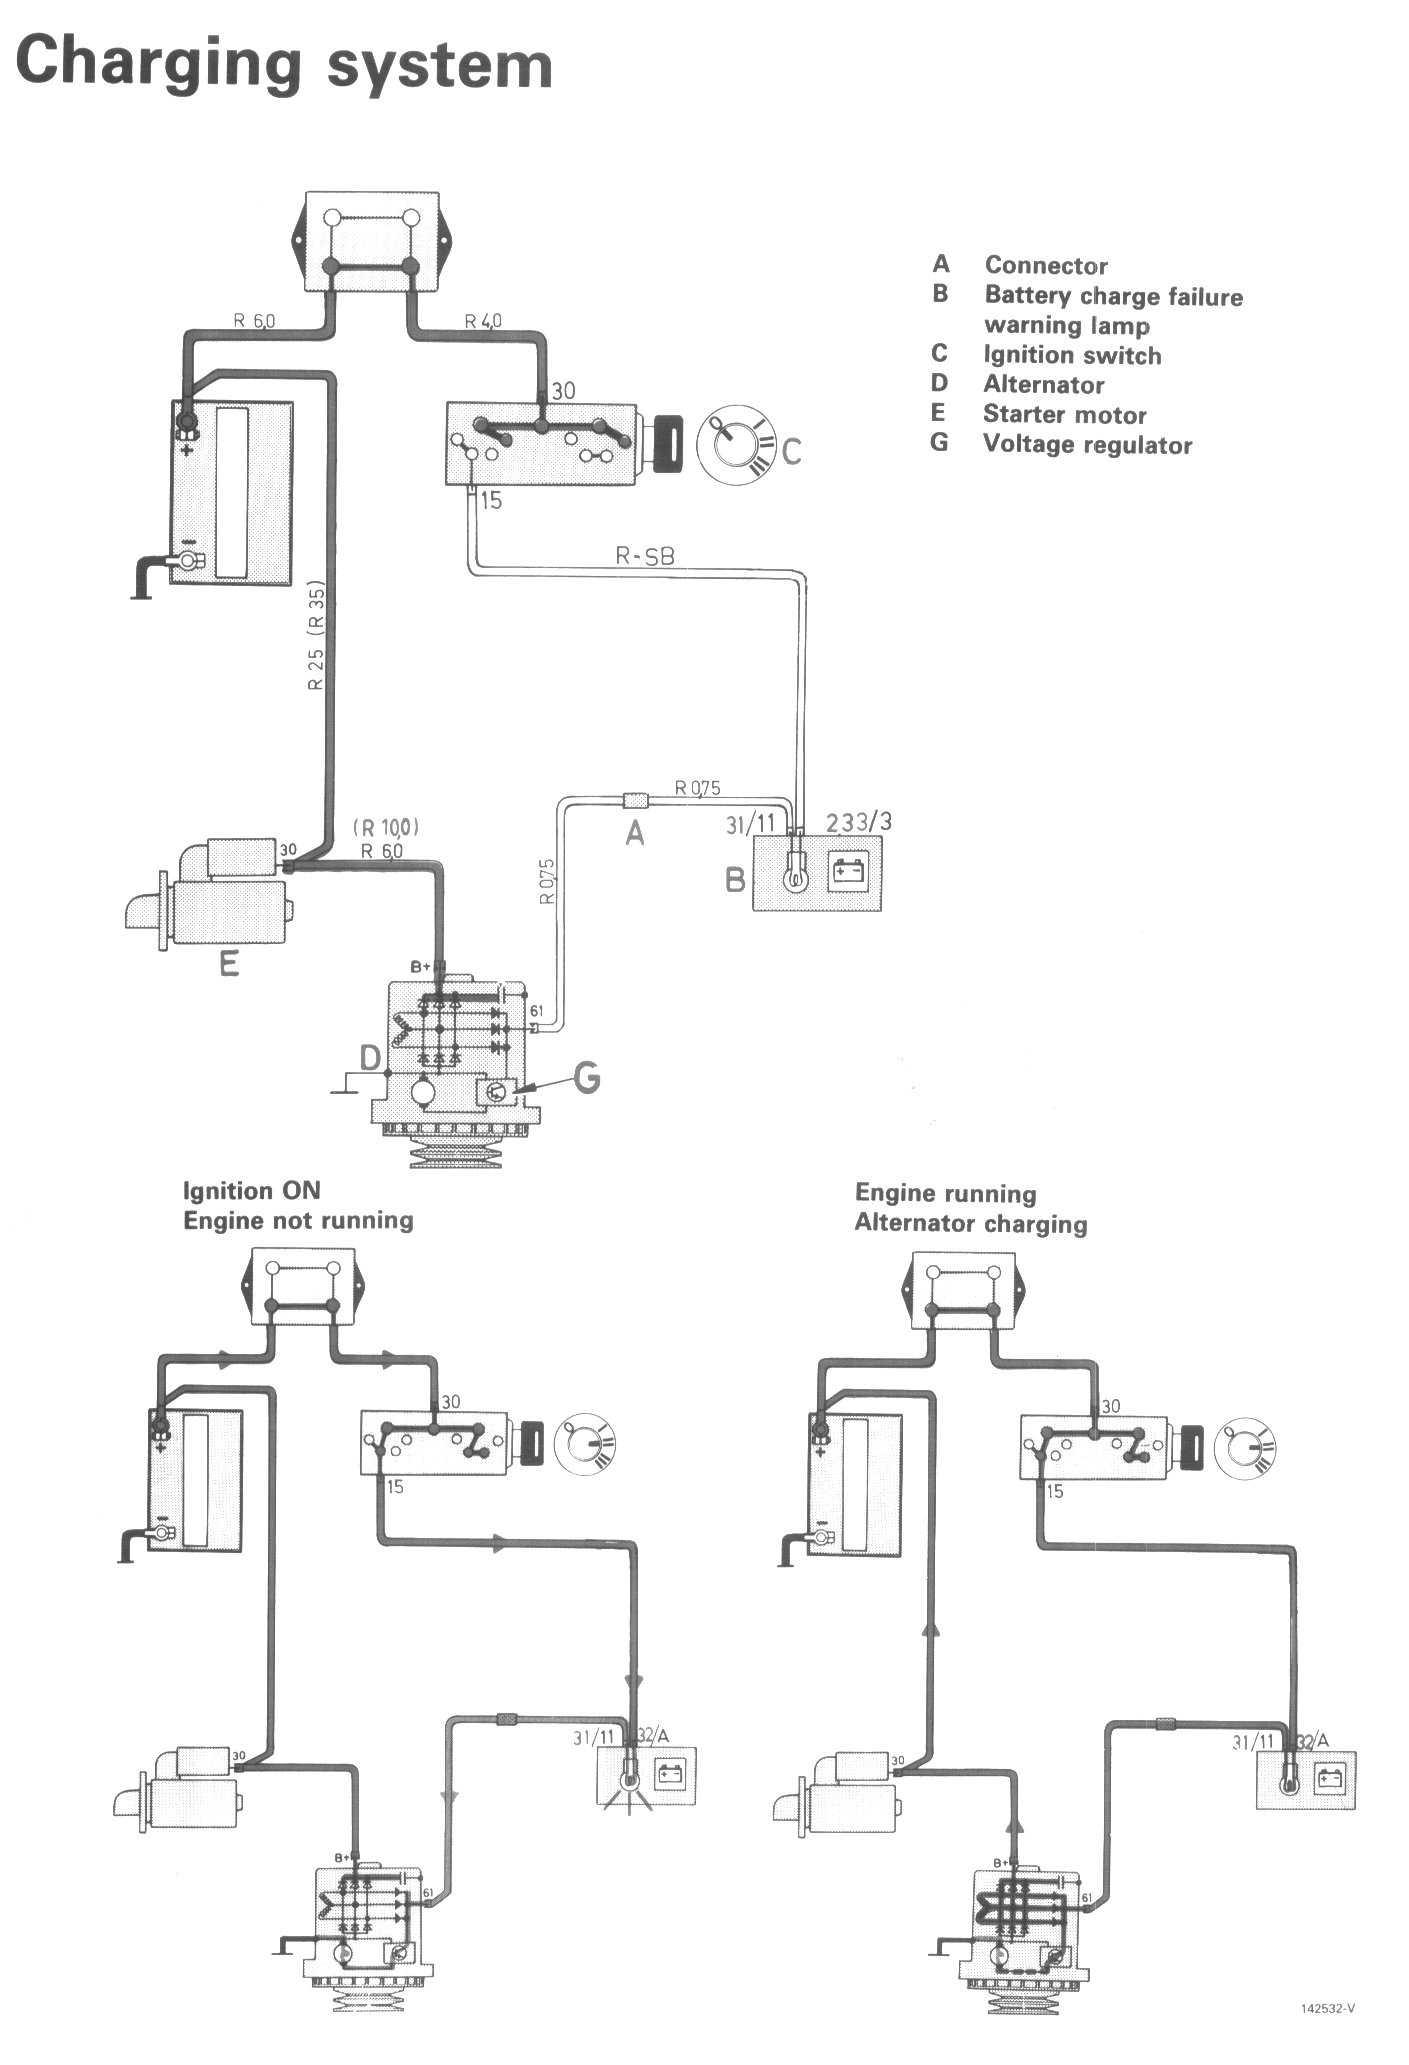 89 Volvo Alternator Wiring Diagram